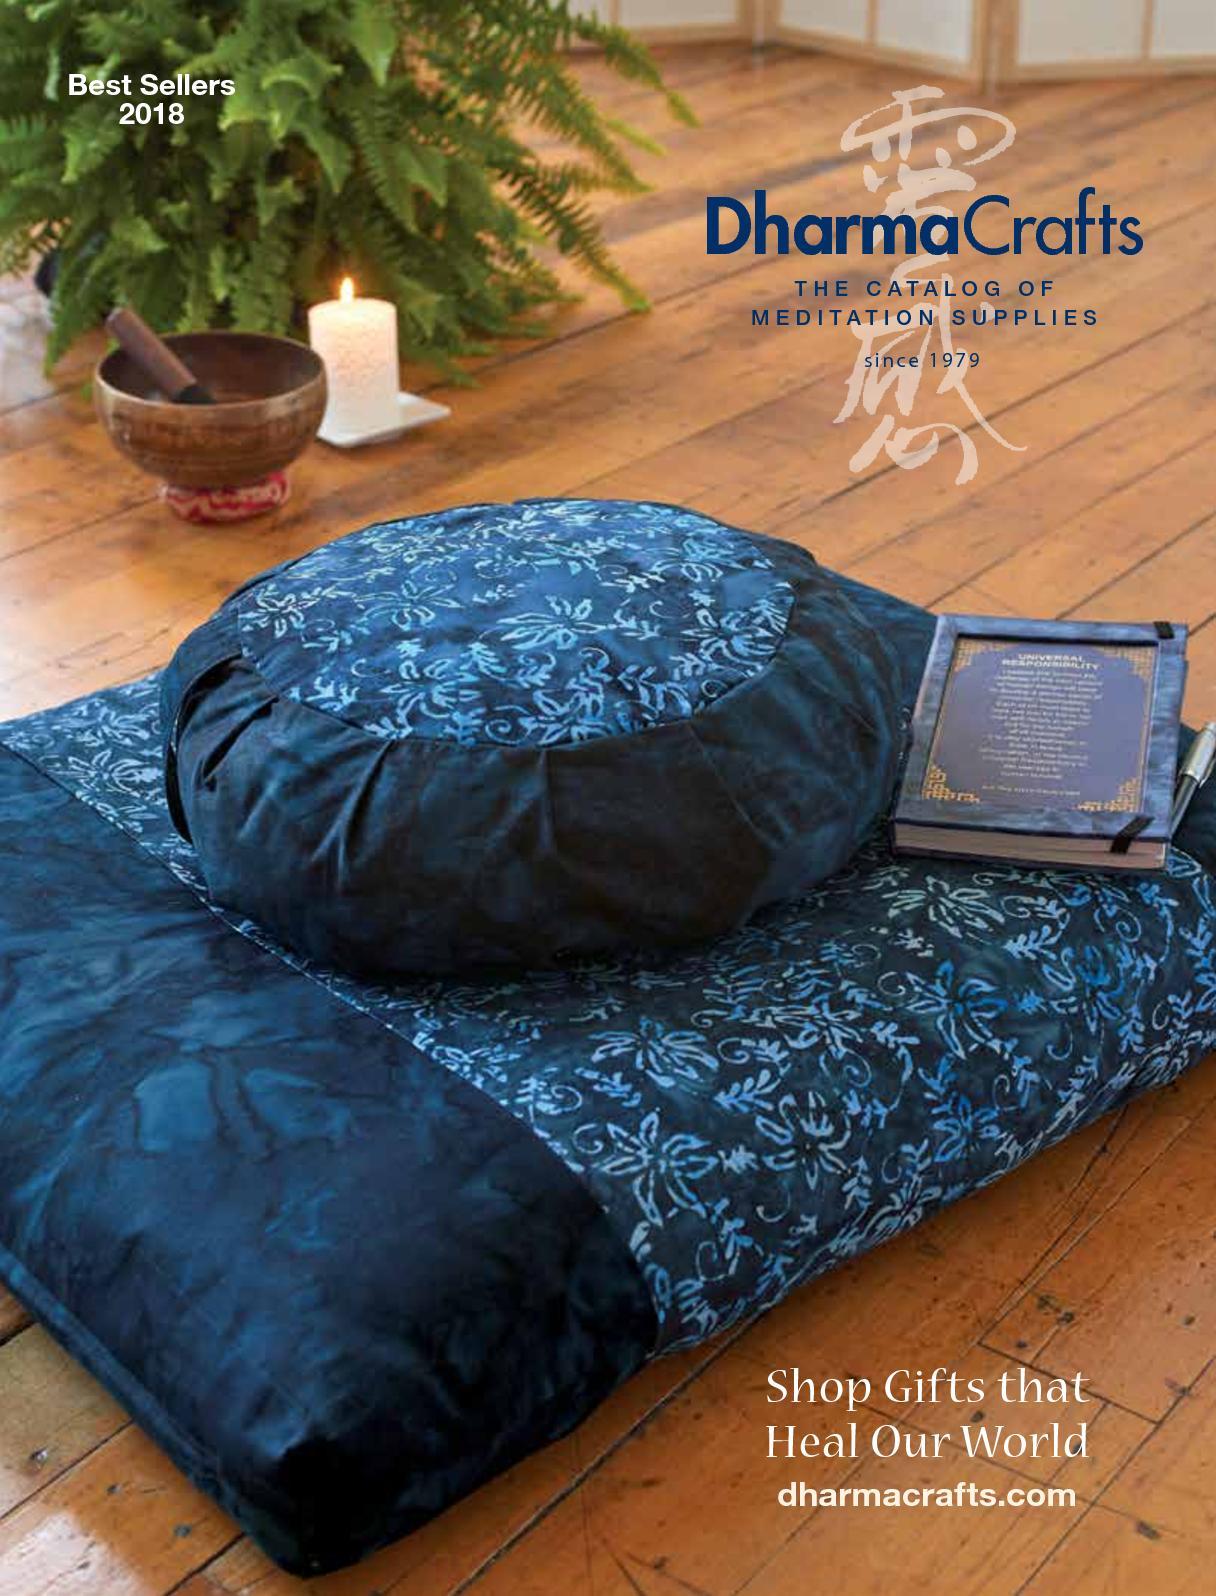 Calaméo Dharmacrafts Holiday 2017 Catalog